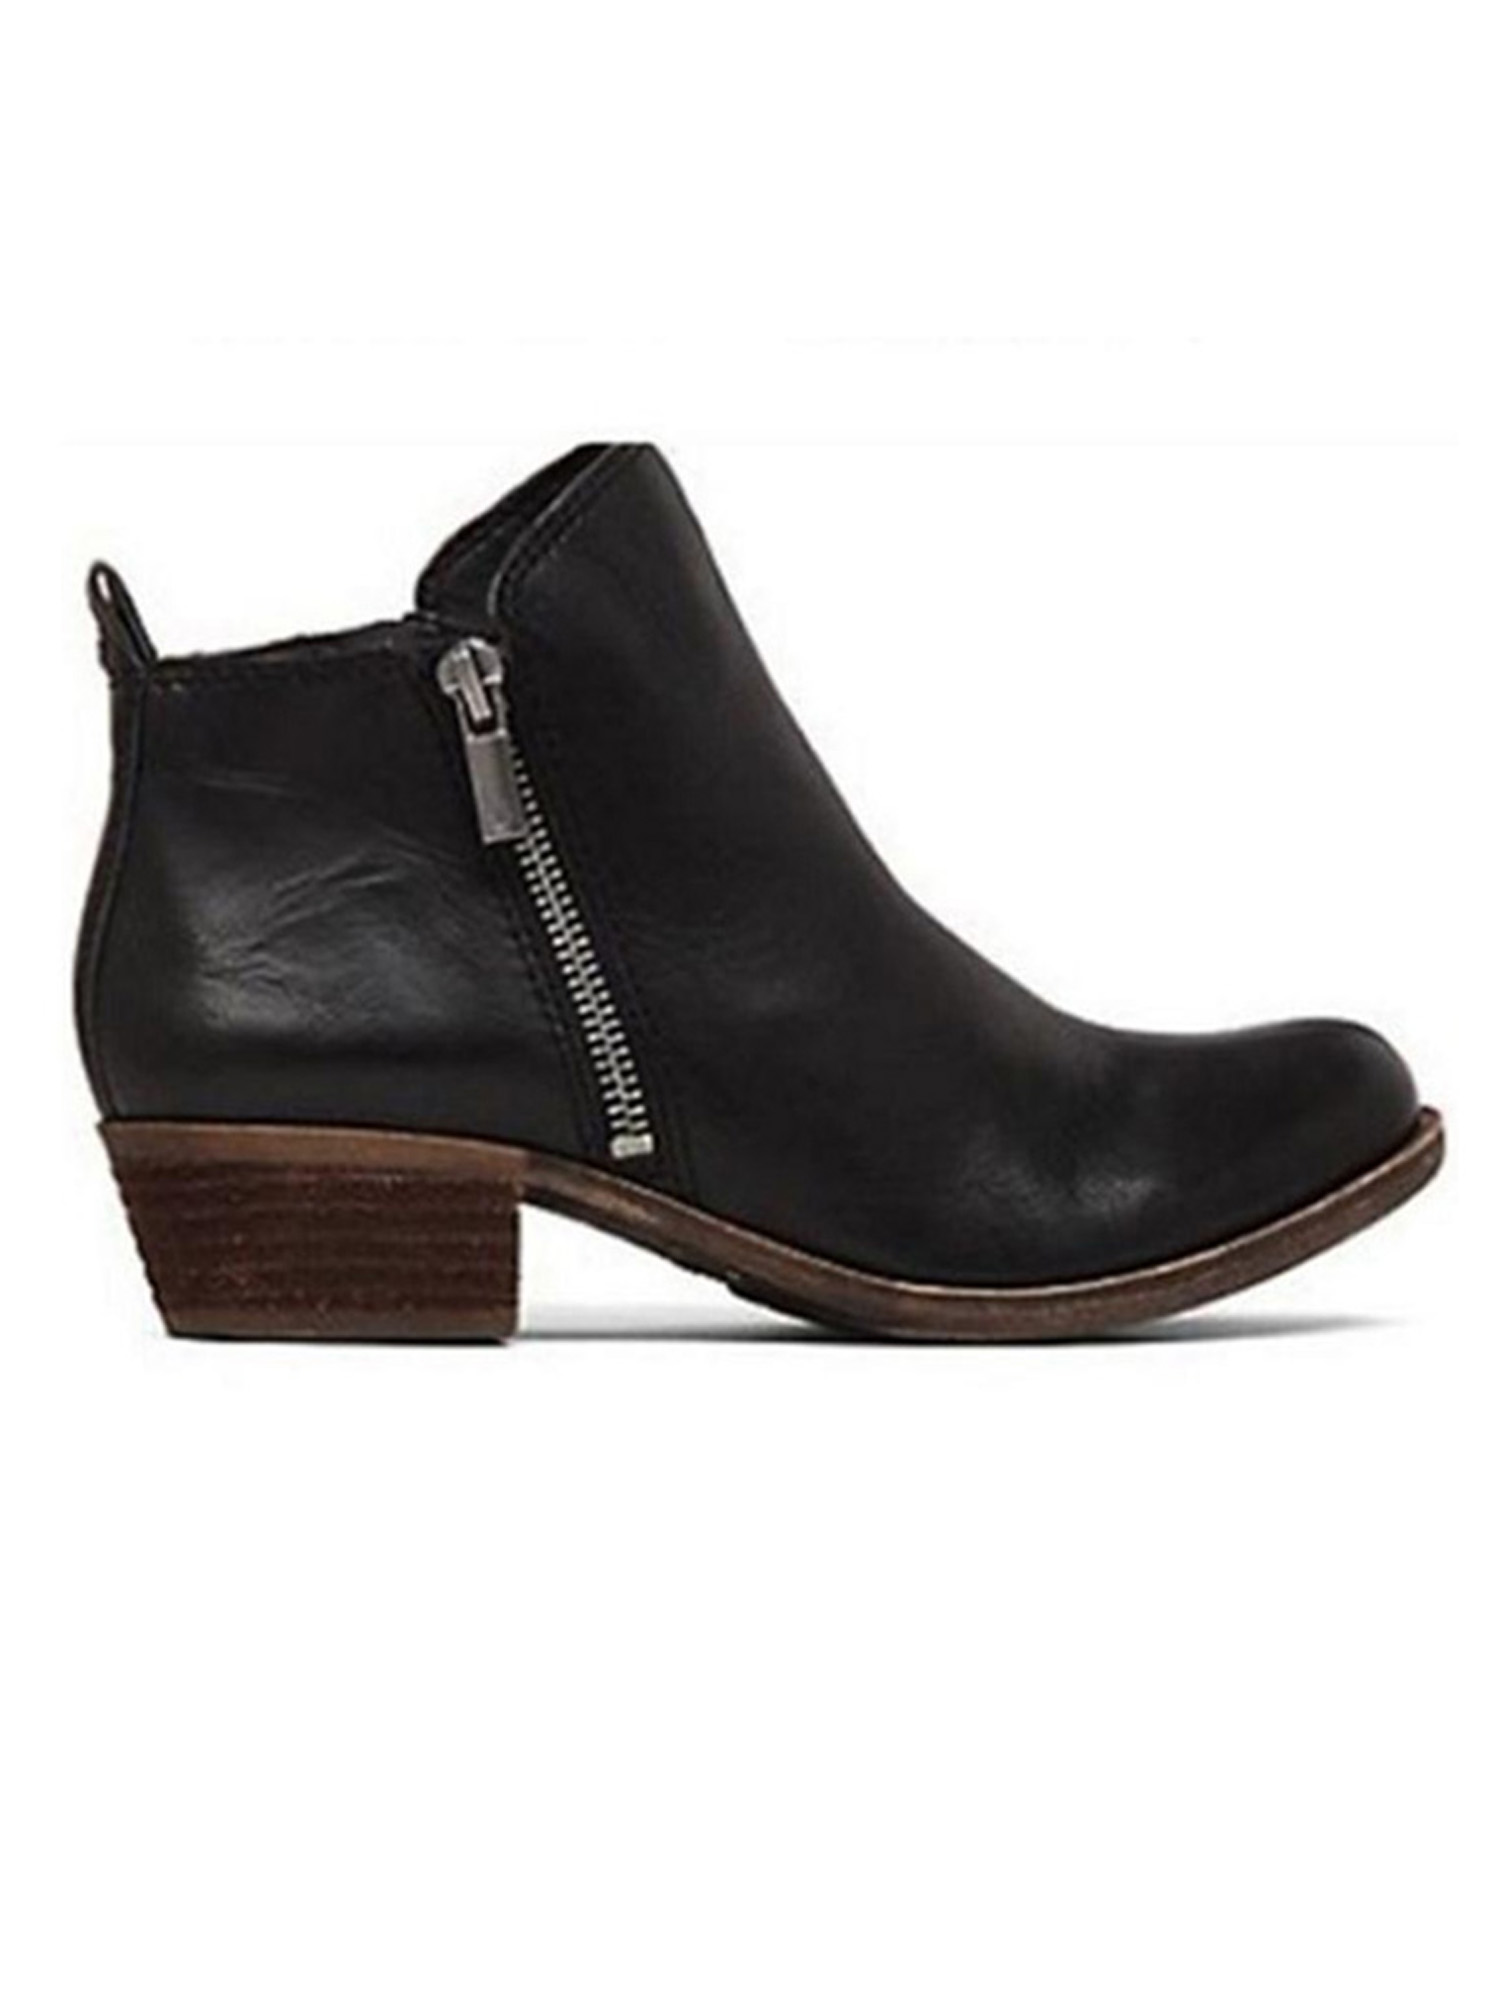 Women Mid Kitten Heel Ankle Boots Ladies Pointy Toe Zipper Booties Chelsea Shoes